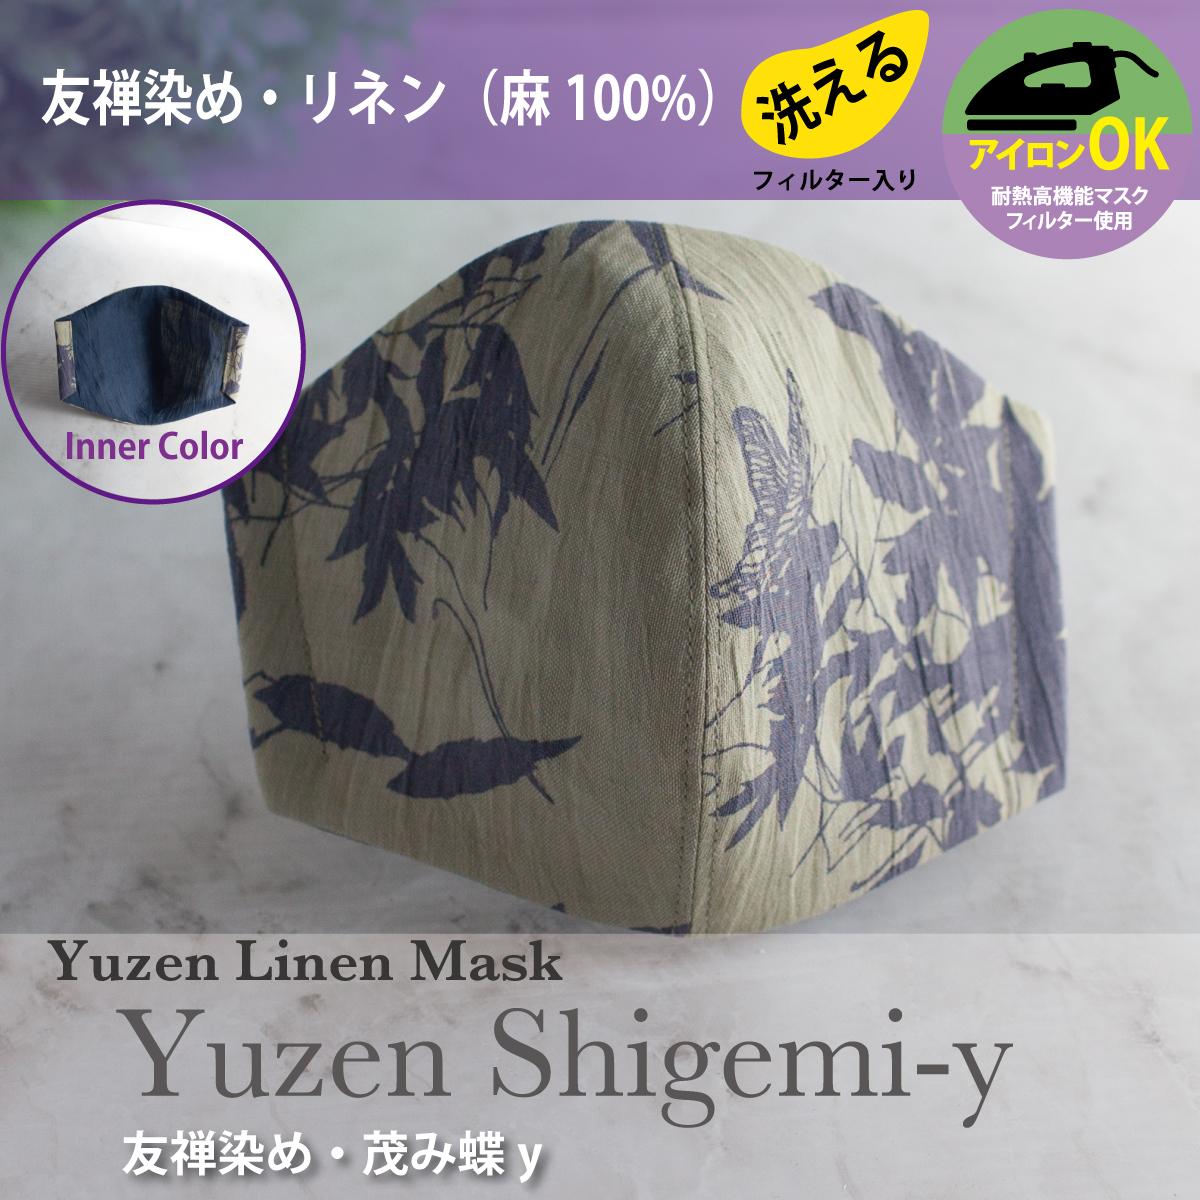 PSNY 友禅マスク・茂みy 花粉 黄砂 洗える不織布フィルター入り 立体 大人用 マスク 送料無料 Y06